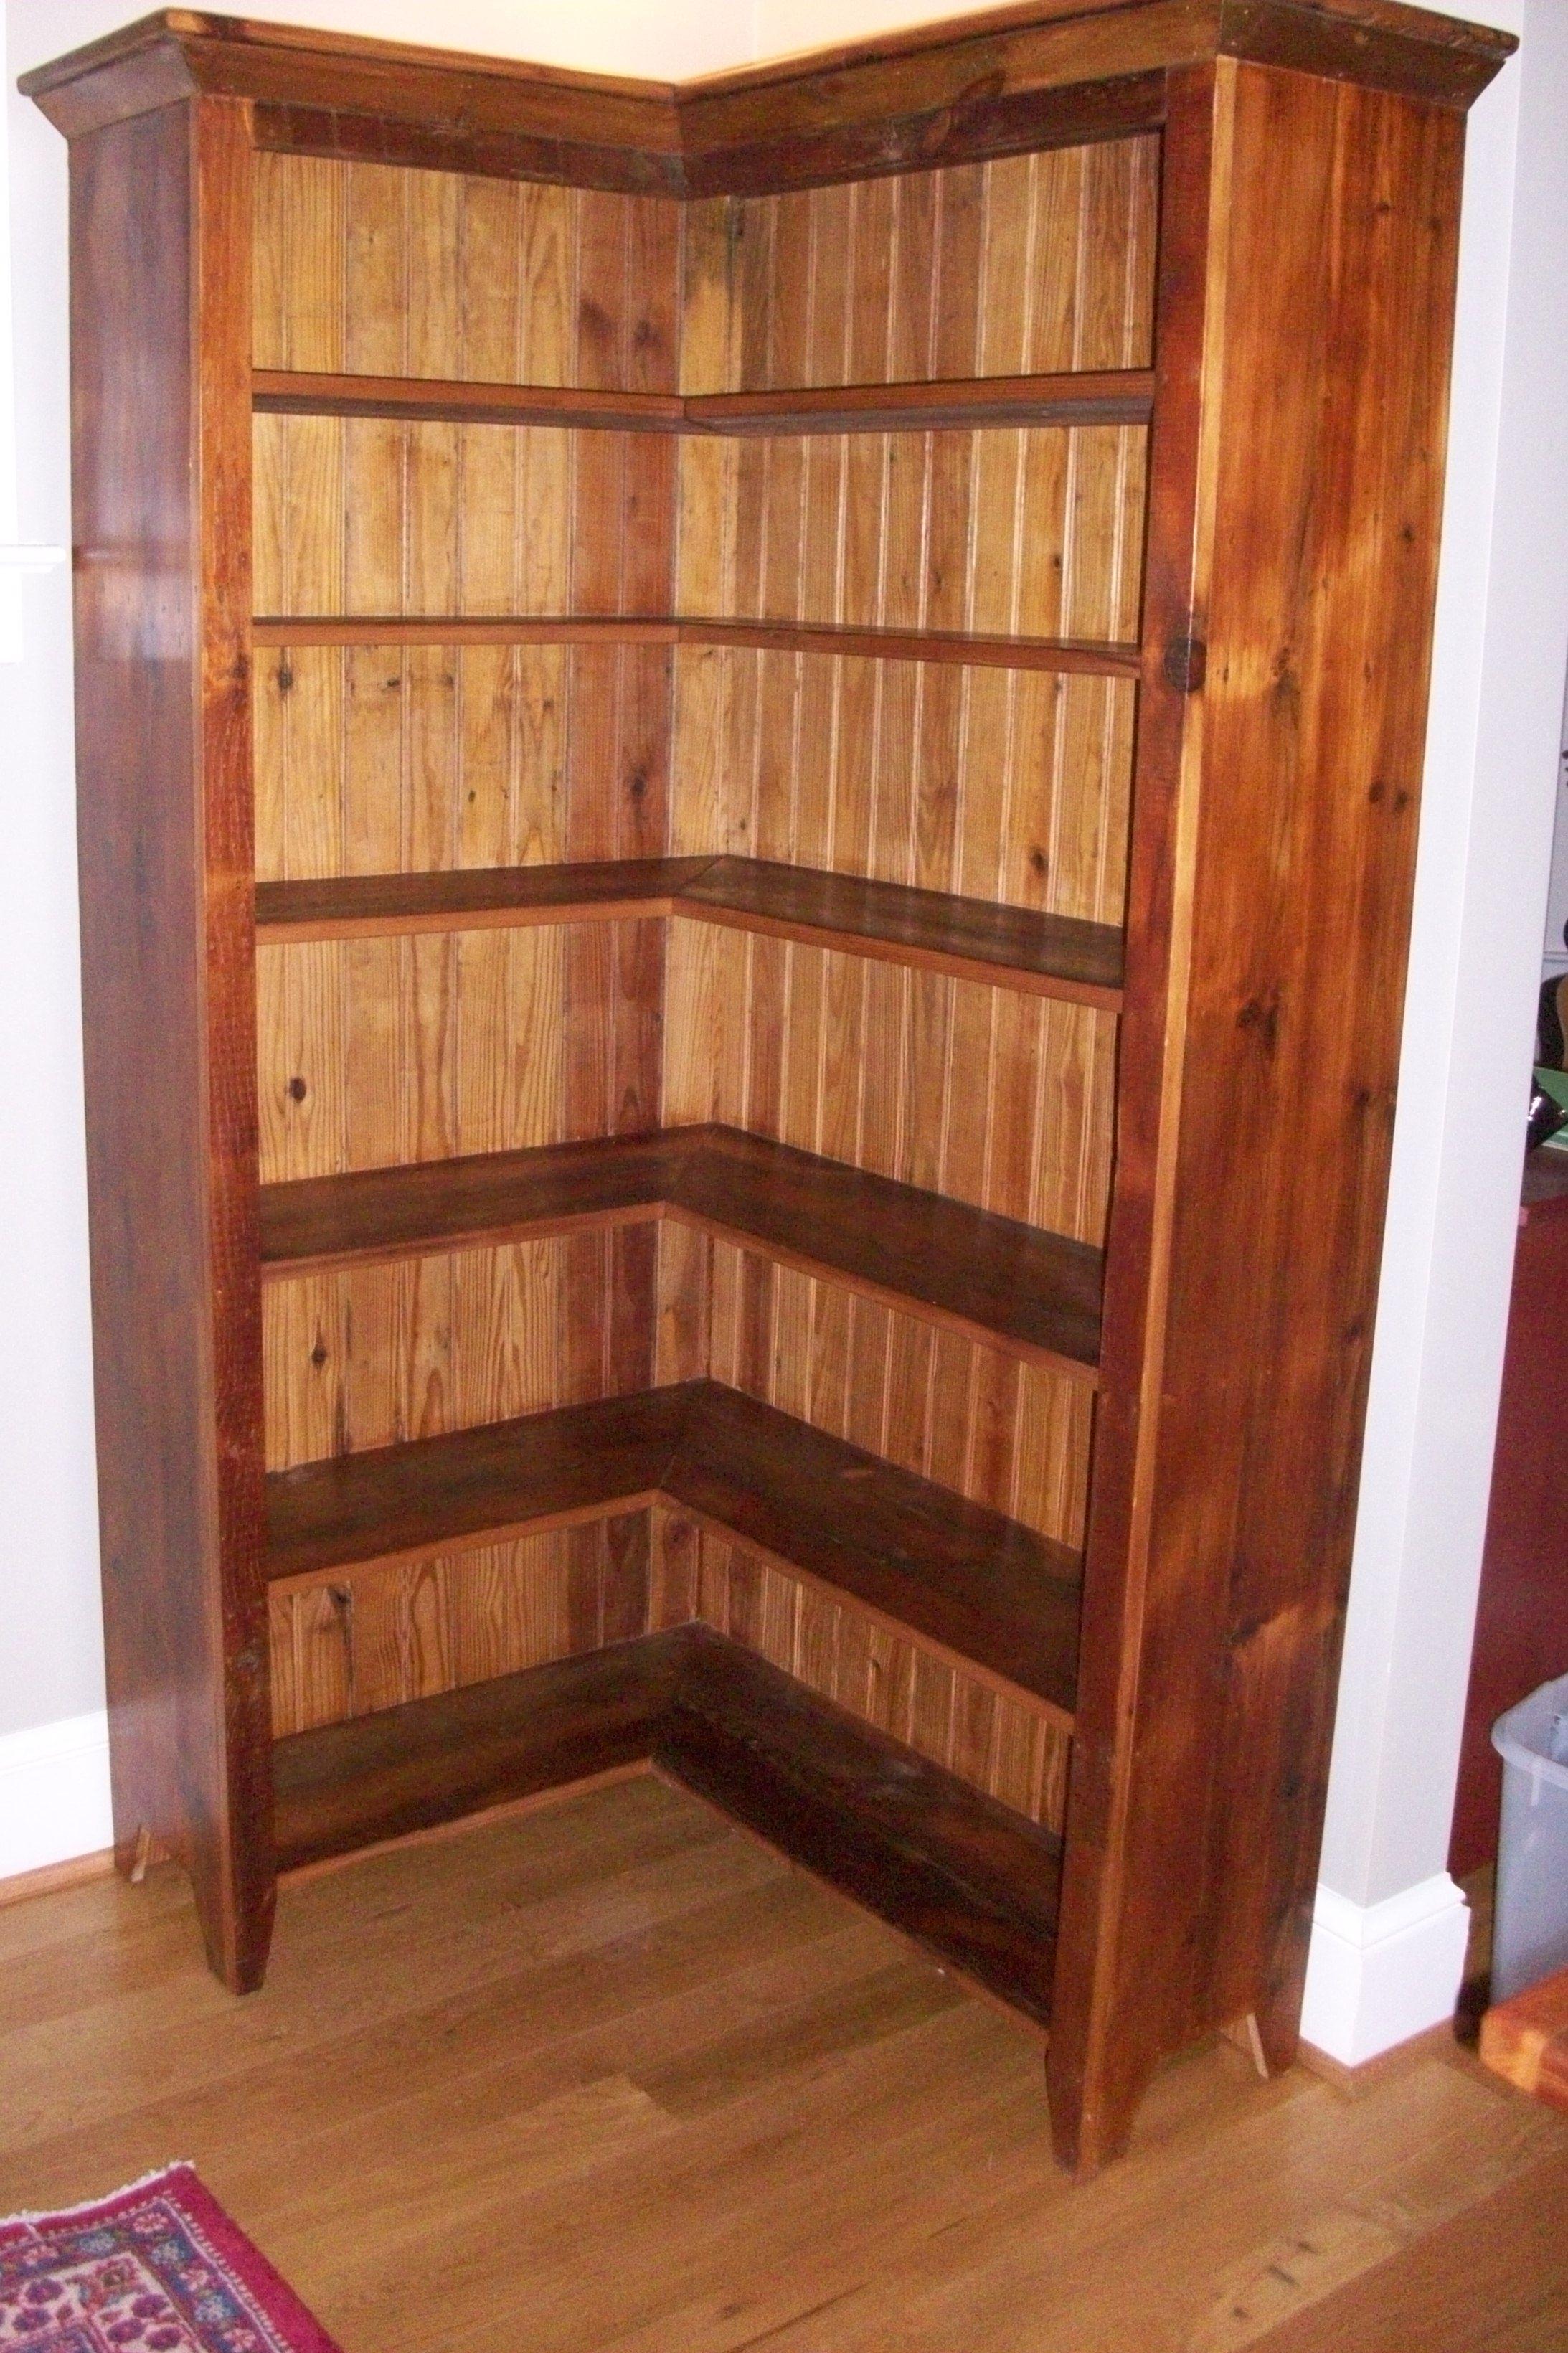 Delightful Corner Bookcase From Furniture From The Barn. Www.furniturefromthebarn.com